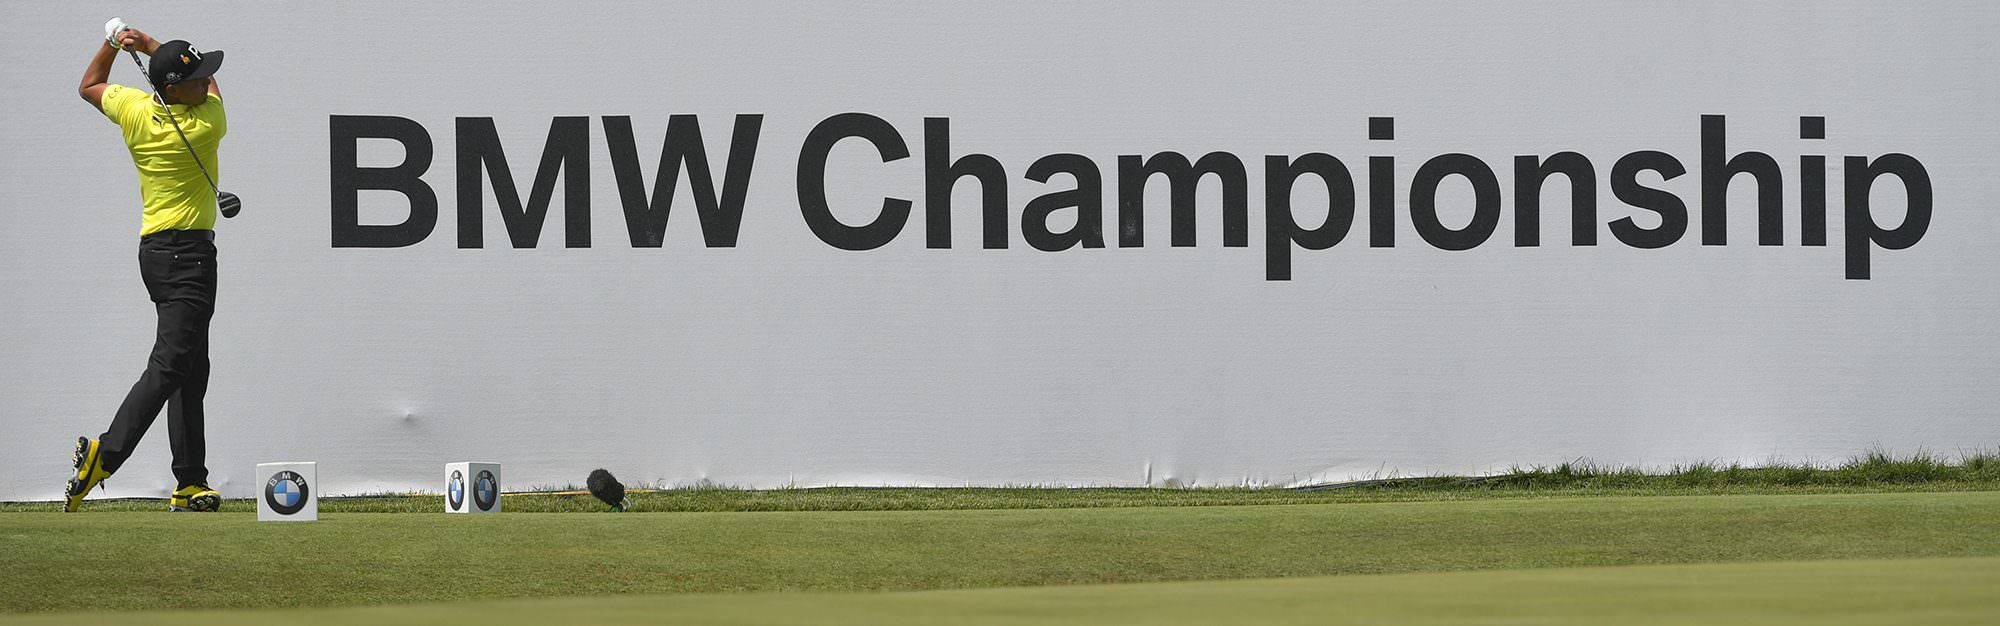 2019 BMW Championship prize money